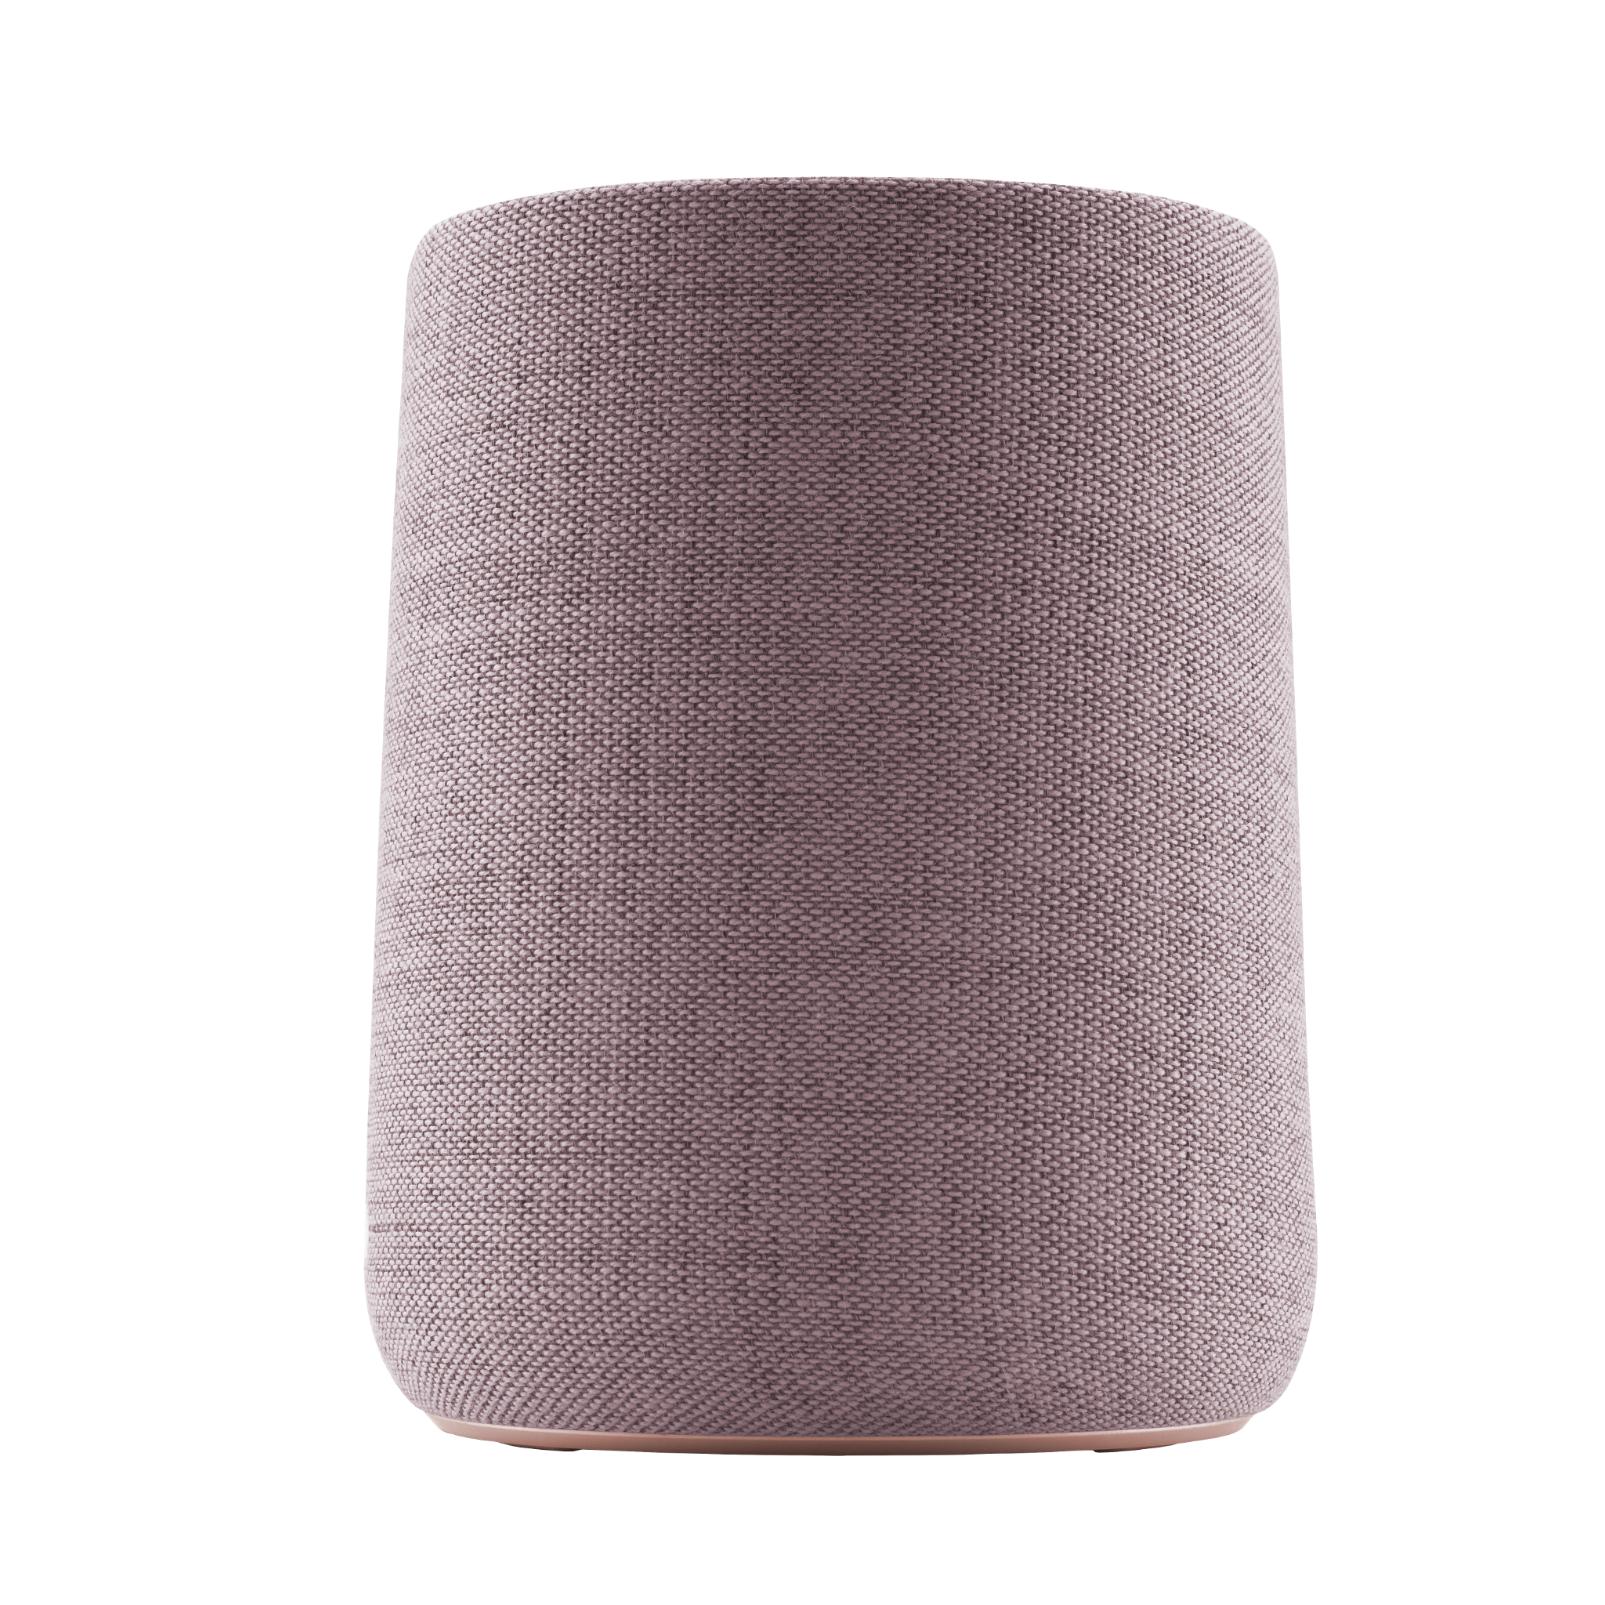 Harman Kardon Citation One MKII - Pink - All-in-one smart speaker with room-filling sound - Left